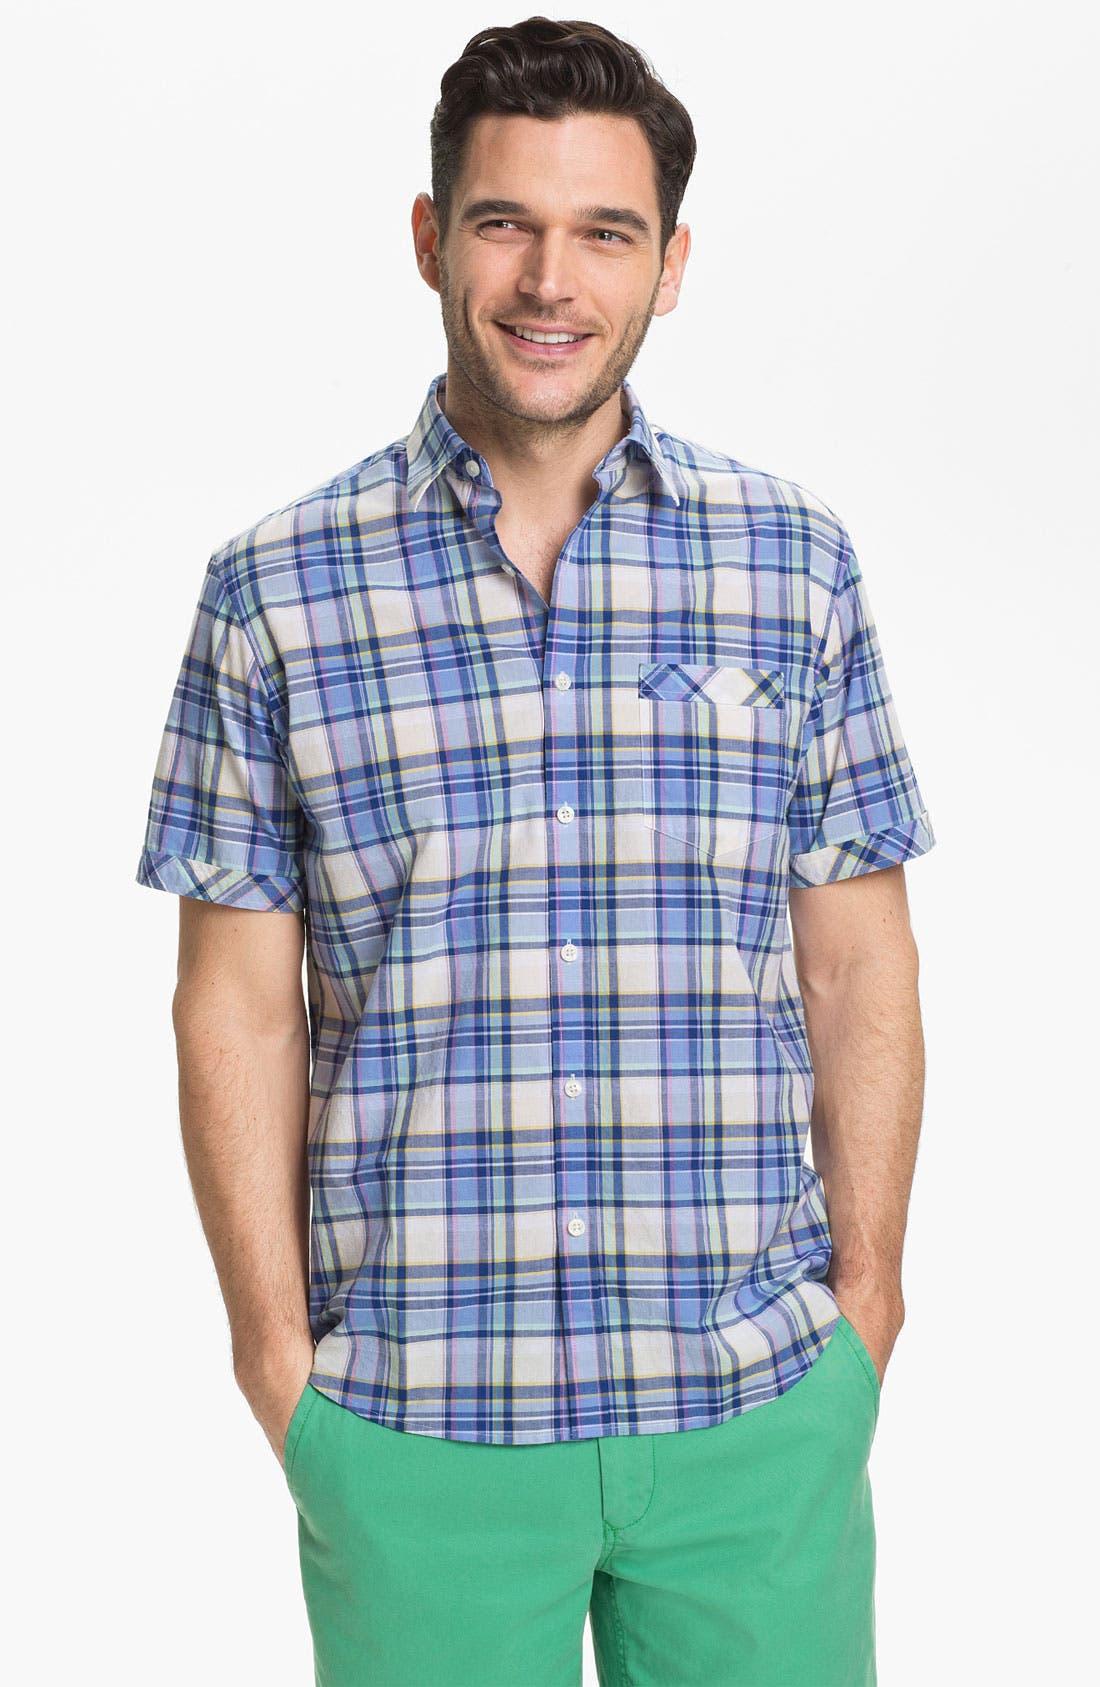 Alternate Image 1 Selected - James Campbell 'Odell Plaid' Sport Shirt